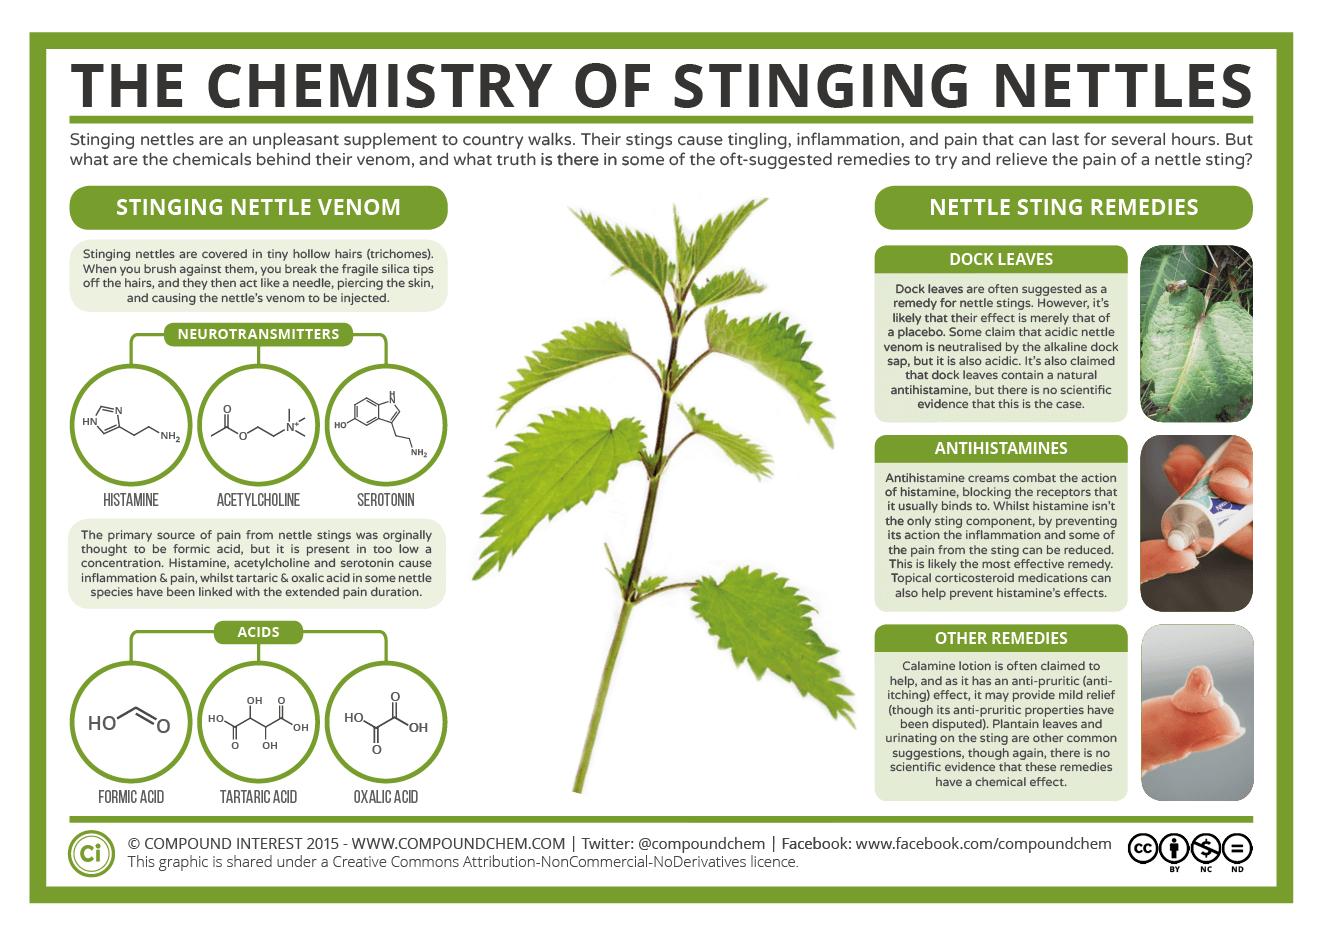 The-Chemistry-of-Stinging-Nettles